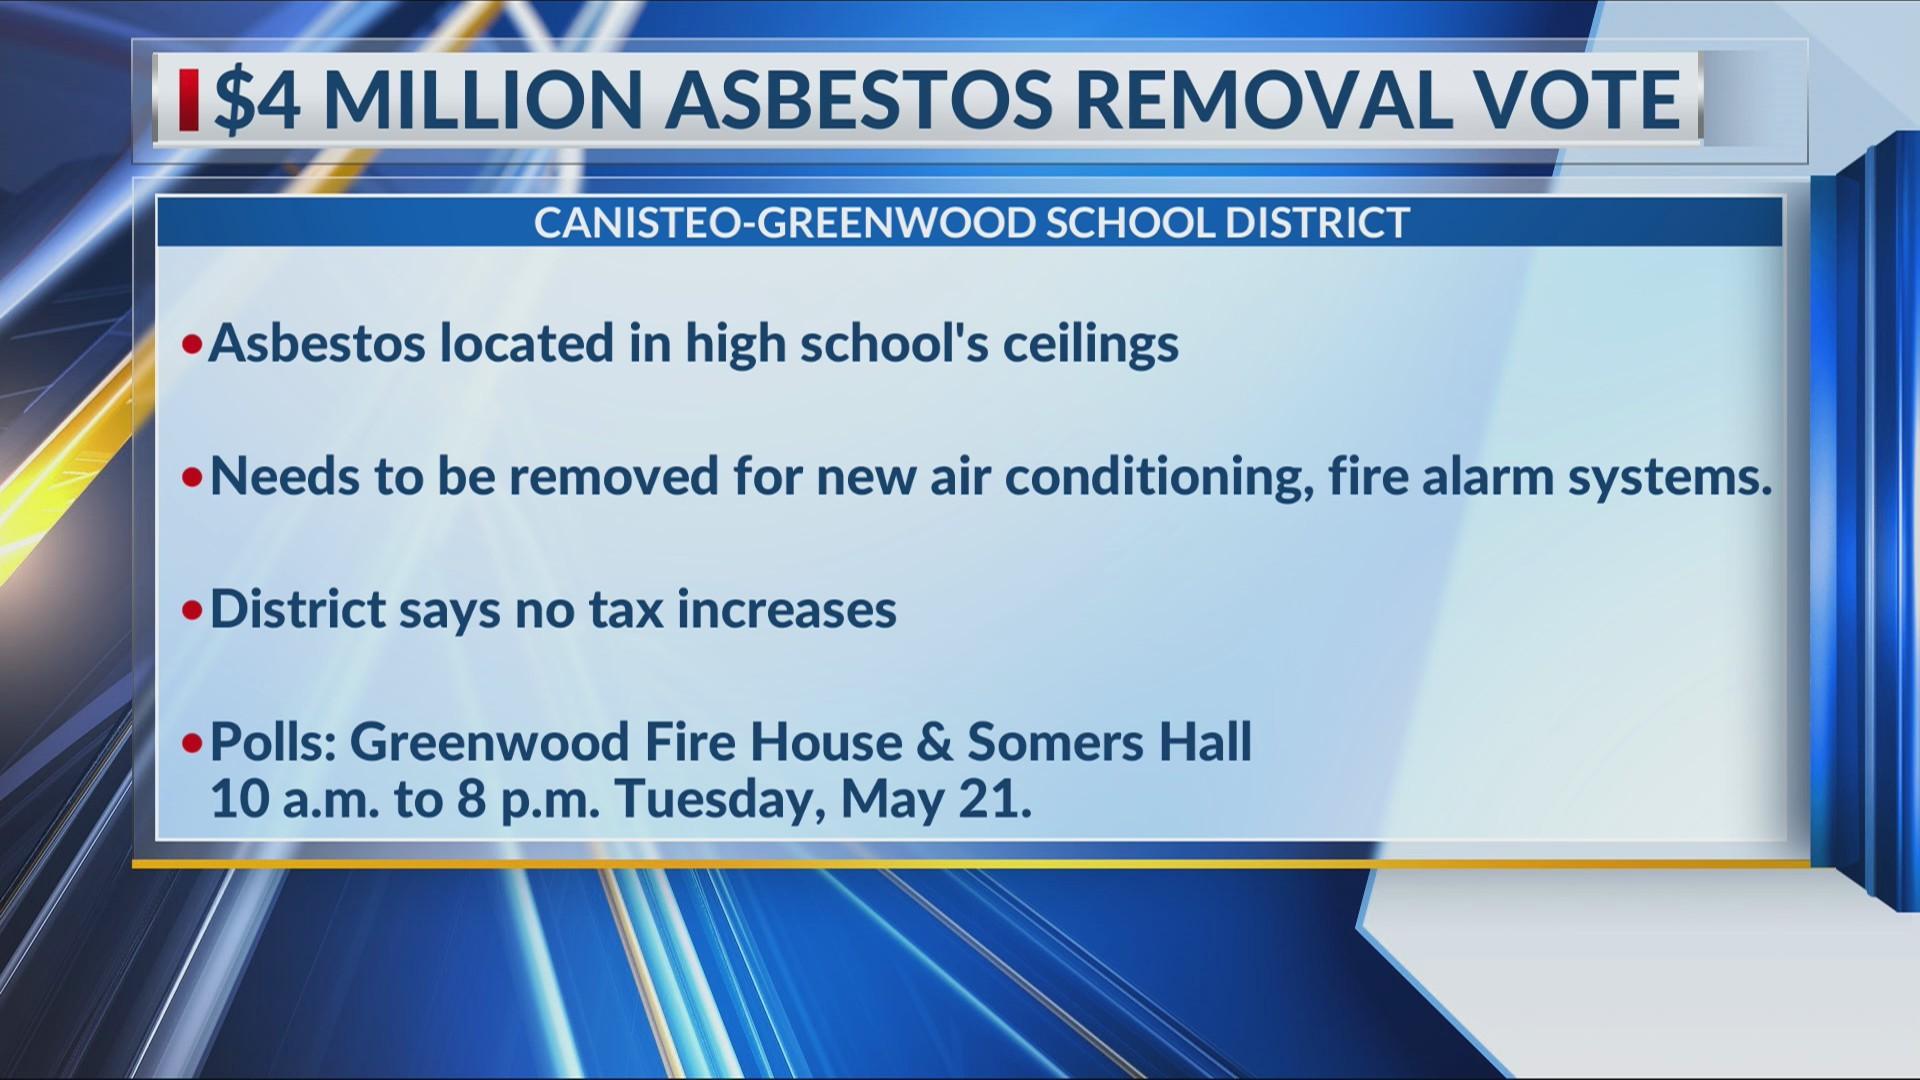 Canisteo_Greenwood_vote_on_asbesto_remov_0_20190519221846